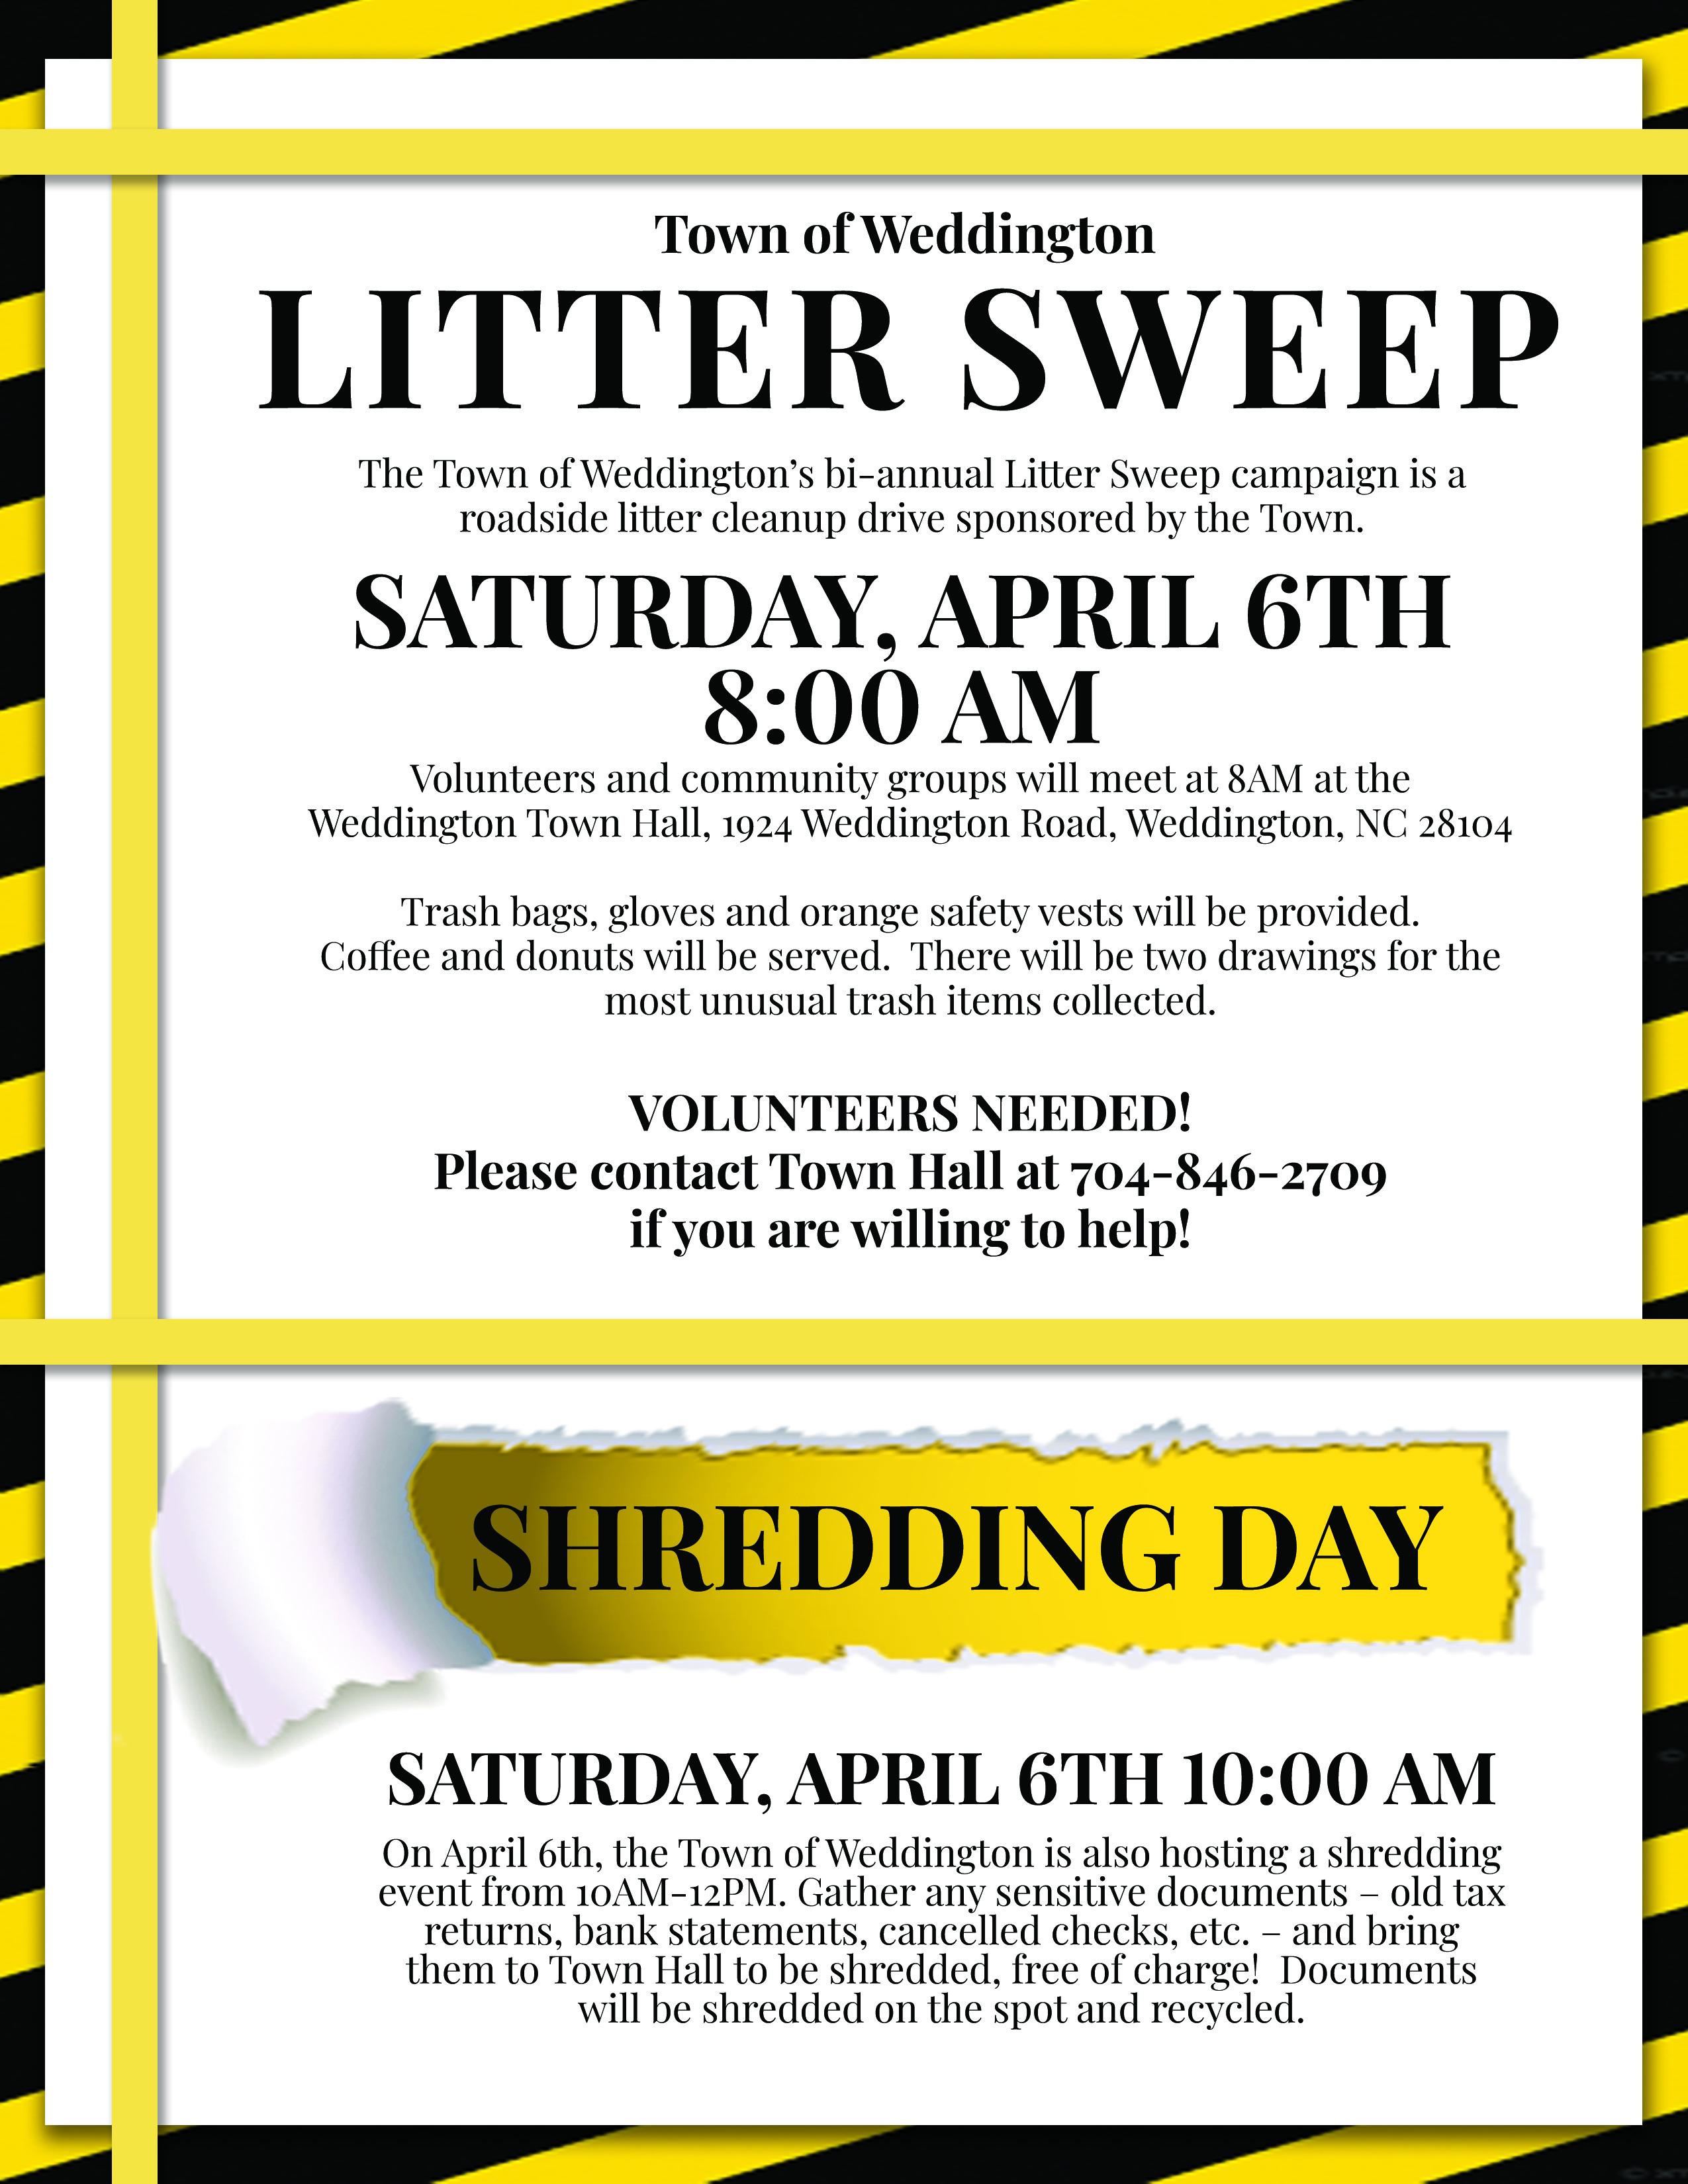 Litter Sweep and Shredding Event | Town of Weddington